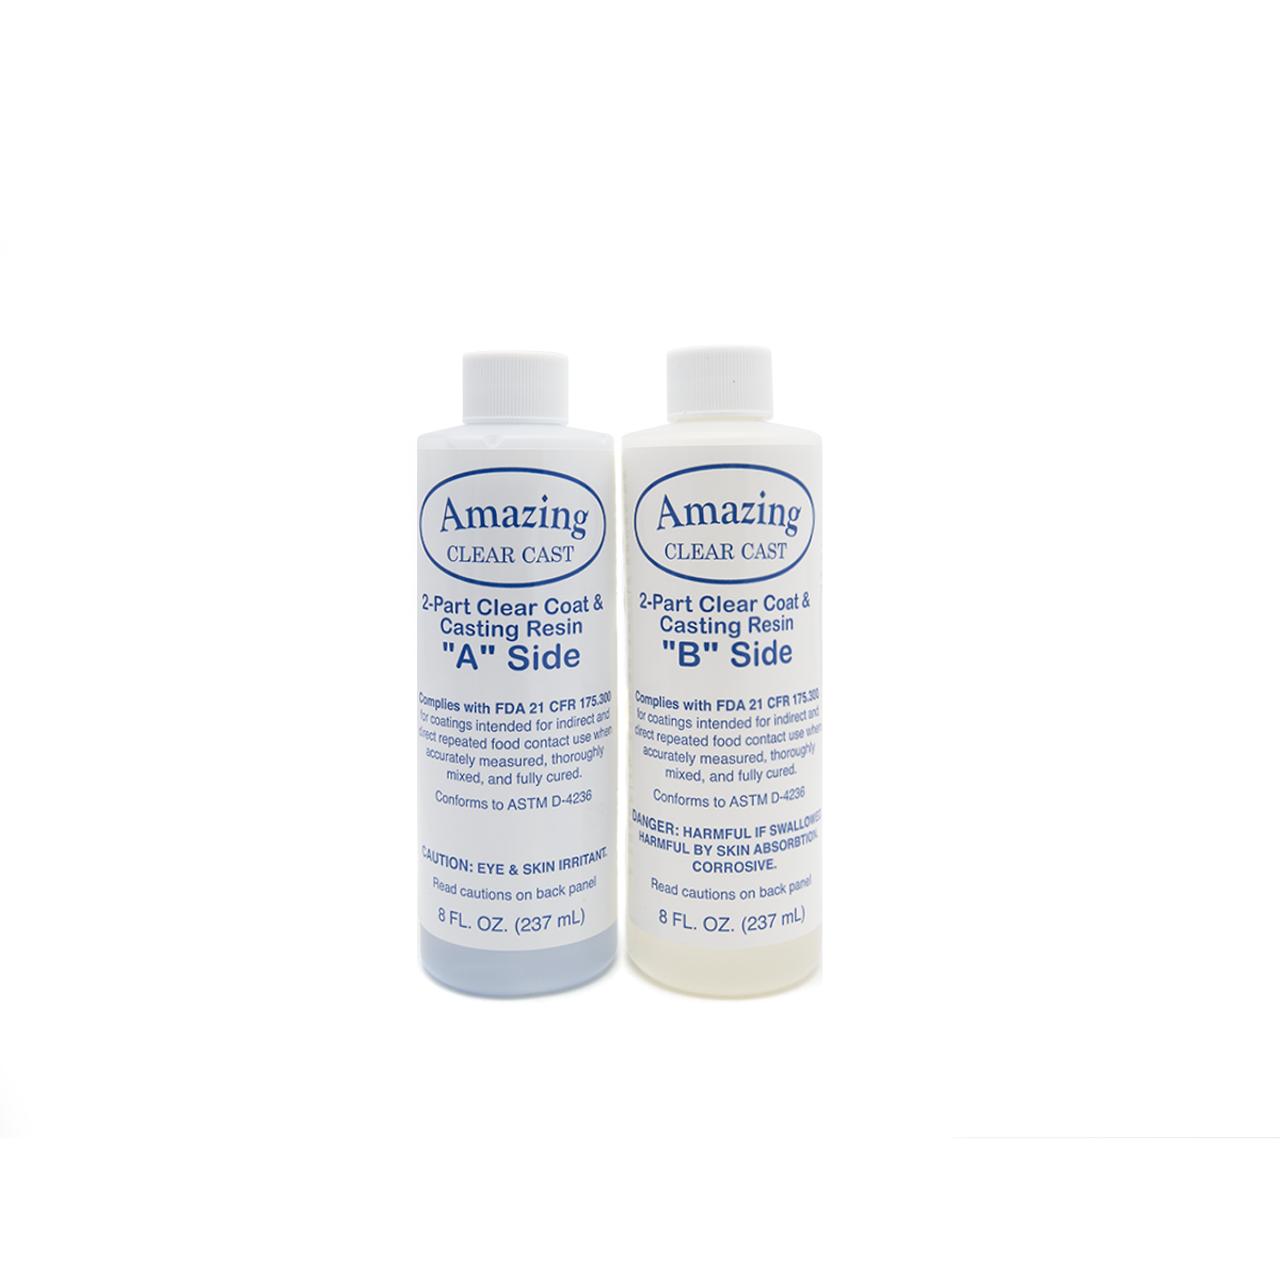 alumilite-amazing-clear-16oz-83024.1580401632.png